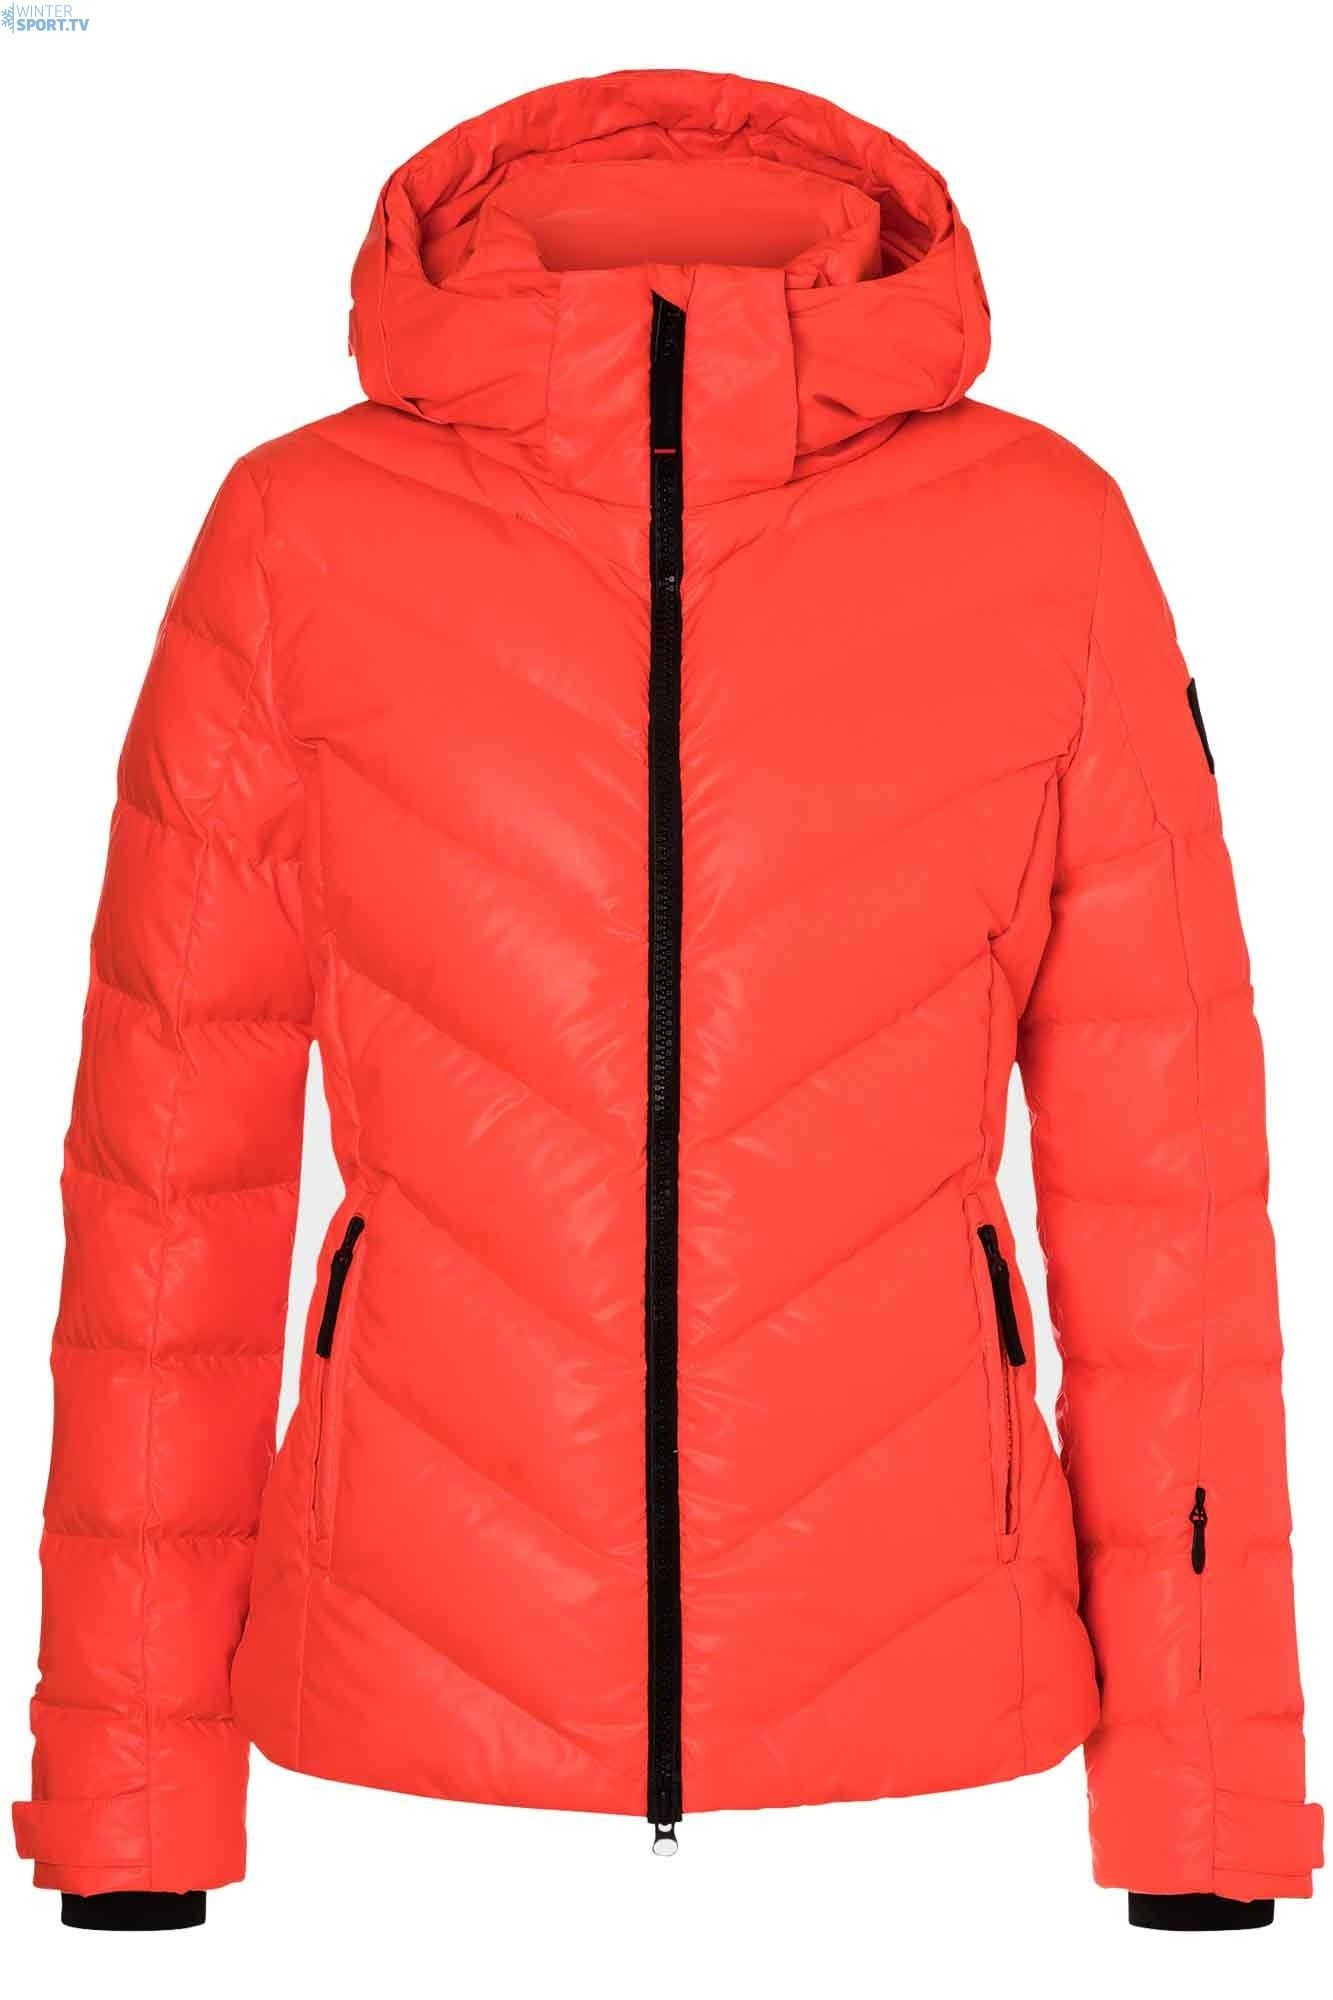 Bogner Fire Ice Women Sassy2 Down Jacket Jacken Frauen Daunenjacke Jacken